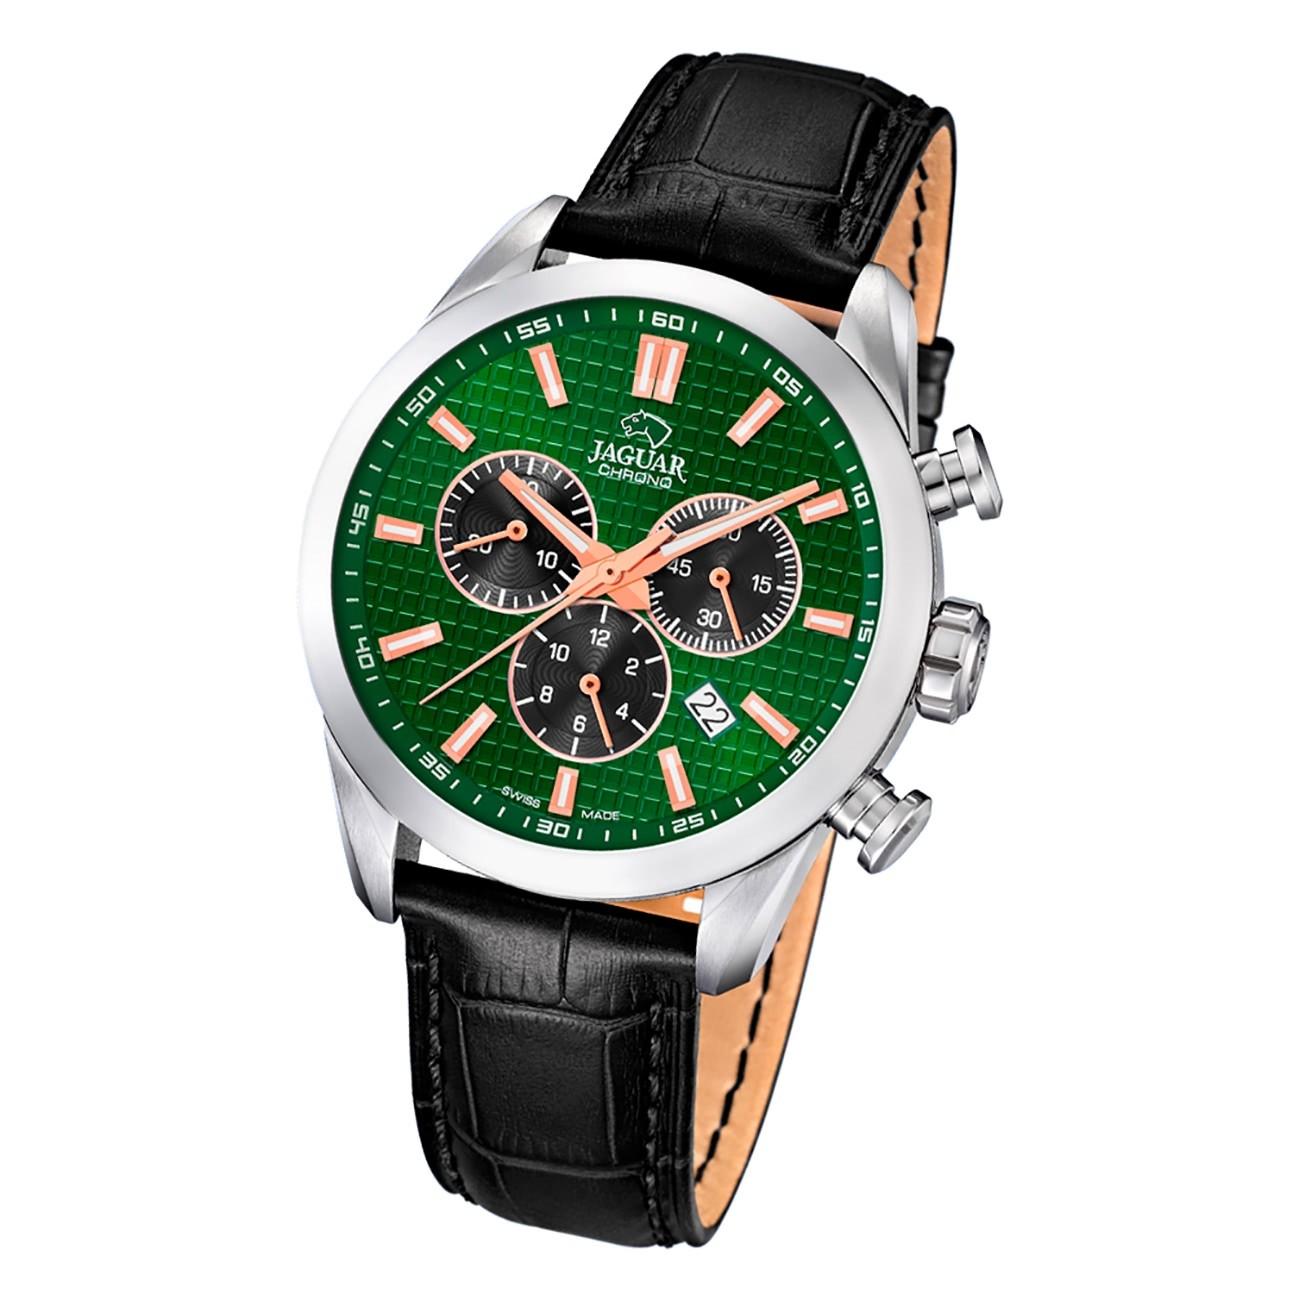 Jaguar Herren Armbanduhr ACM J866/3 Chronograph Leder schwarz UJ866/3